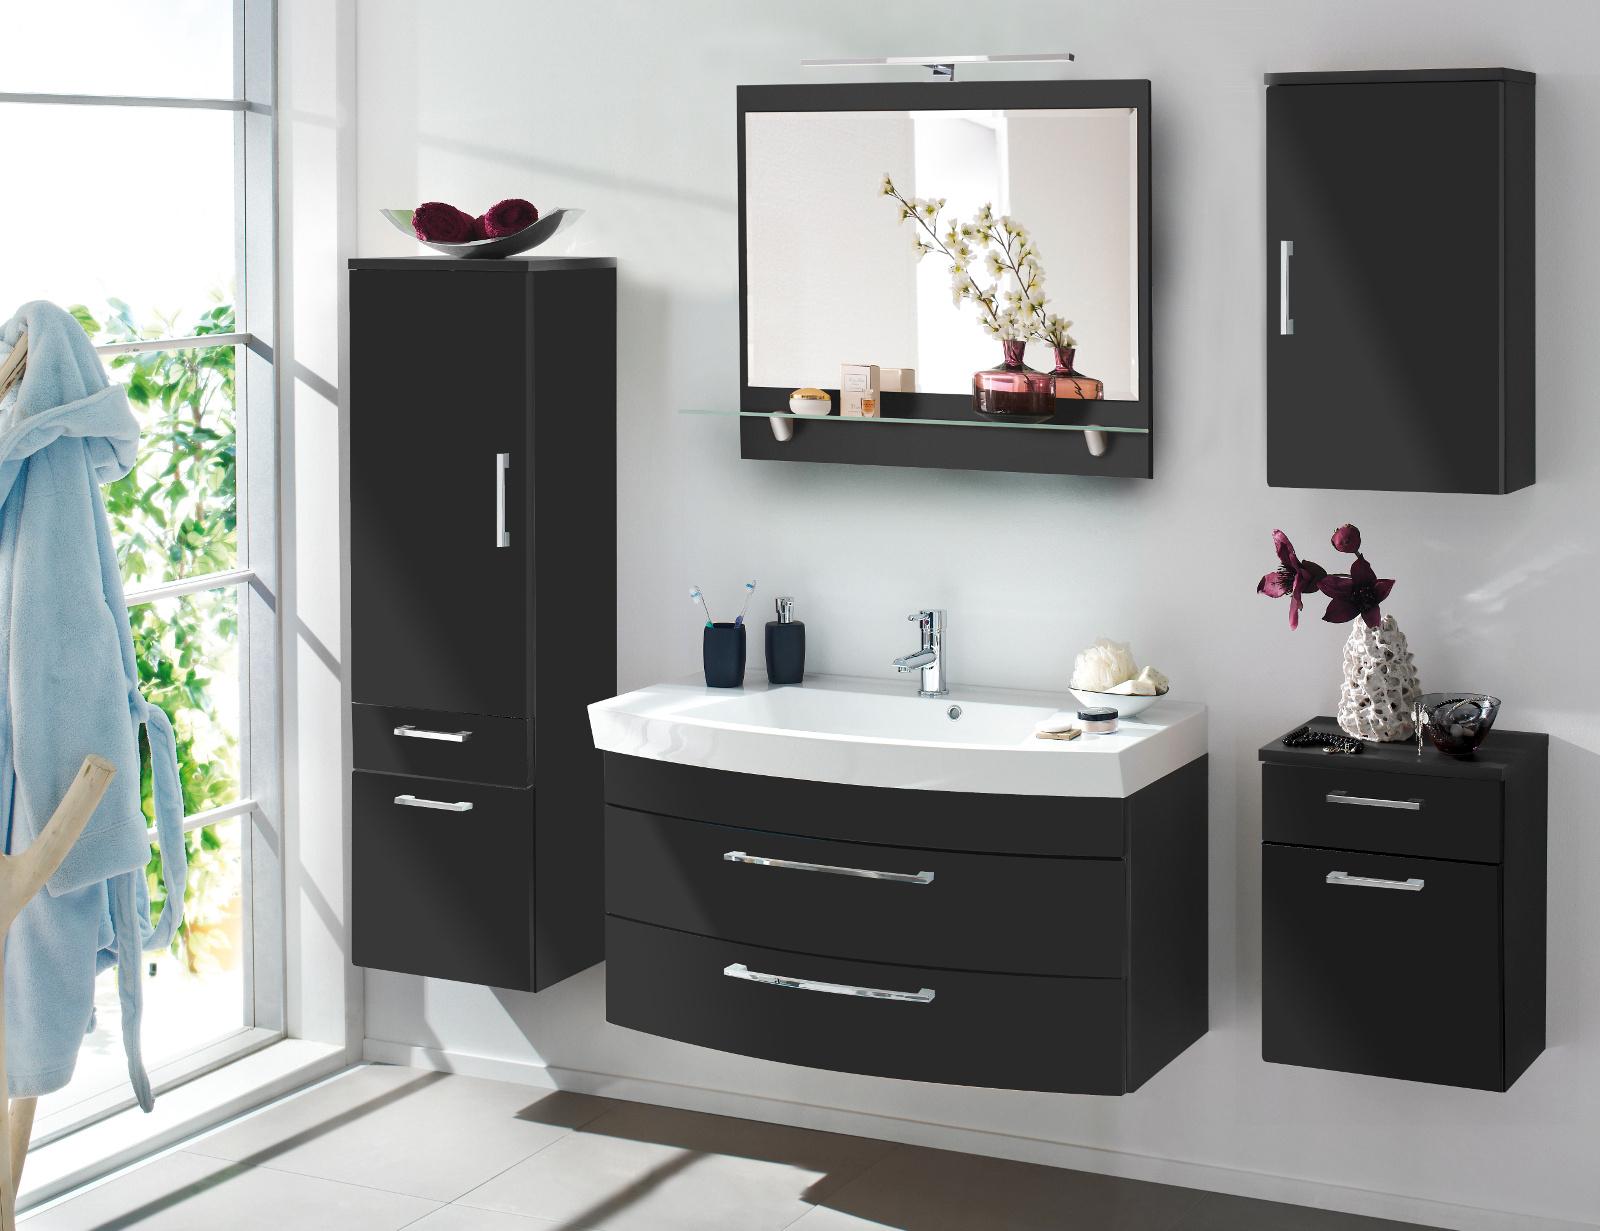 Wohnwand anbauwand teilmassiv modern pandaras2   designermöbel ...